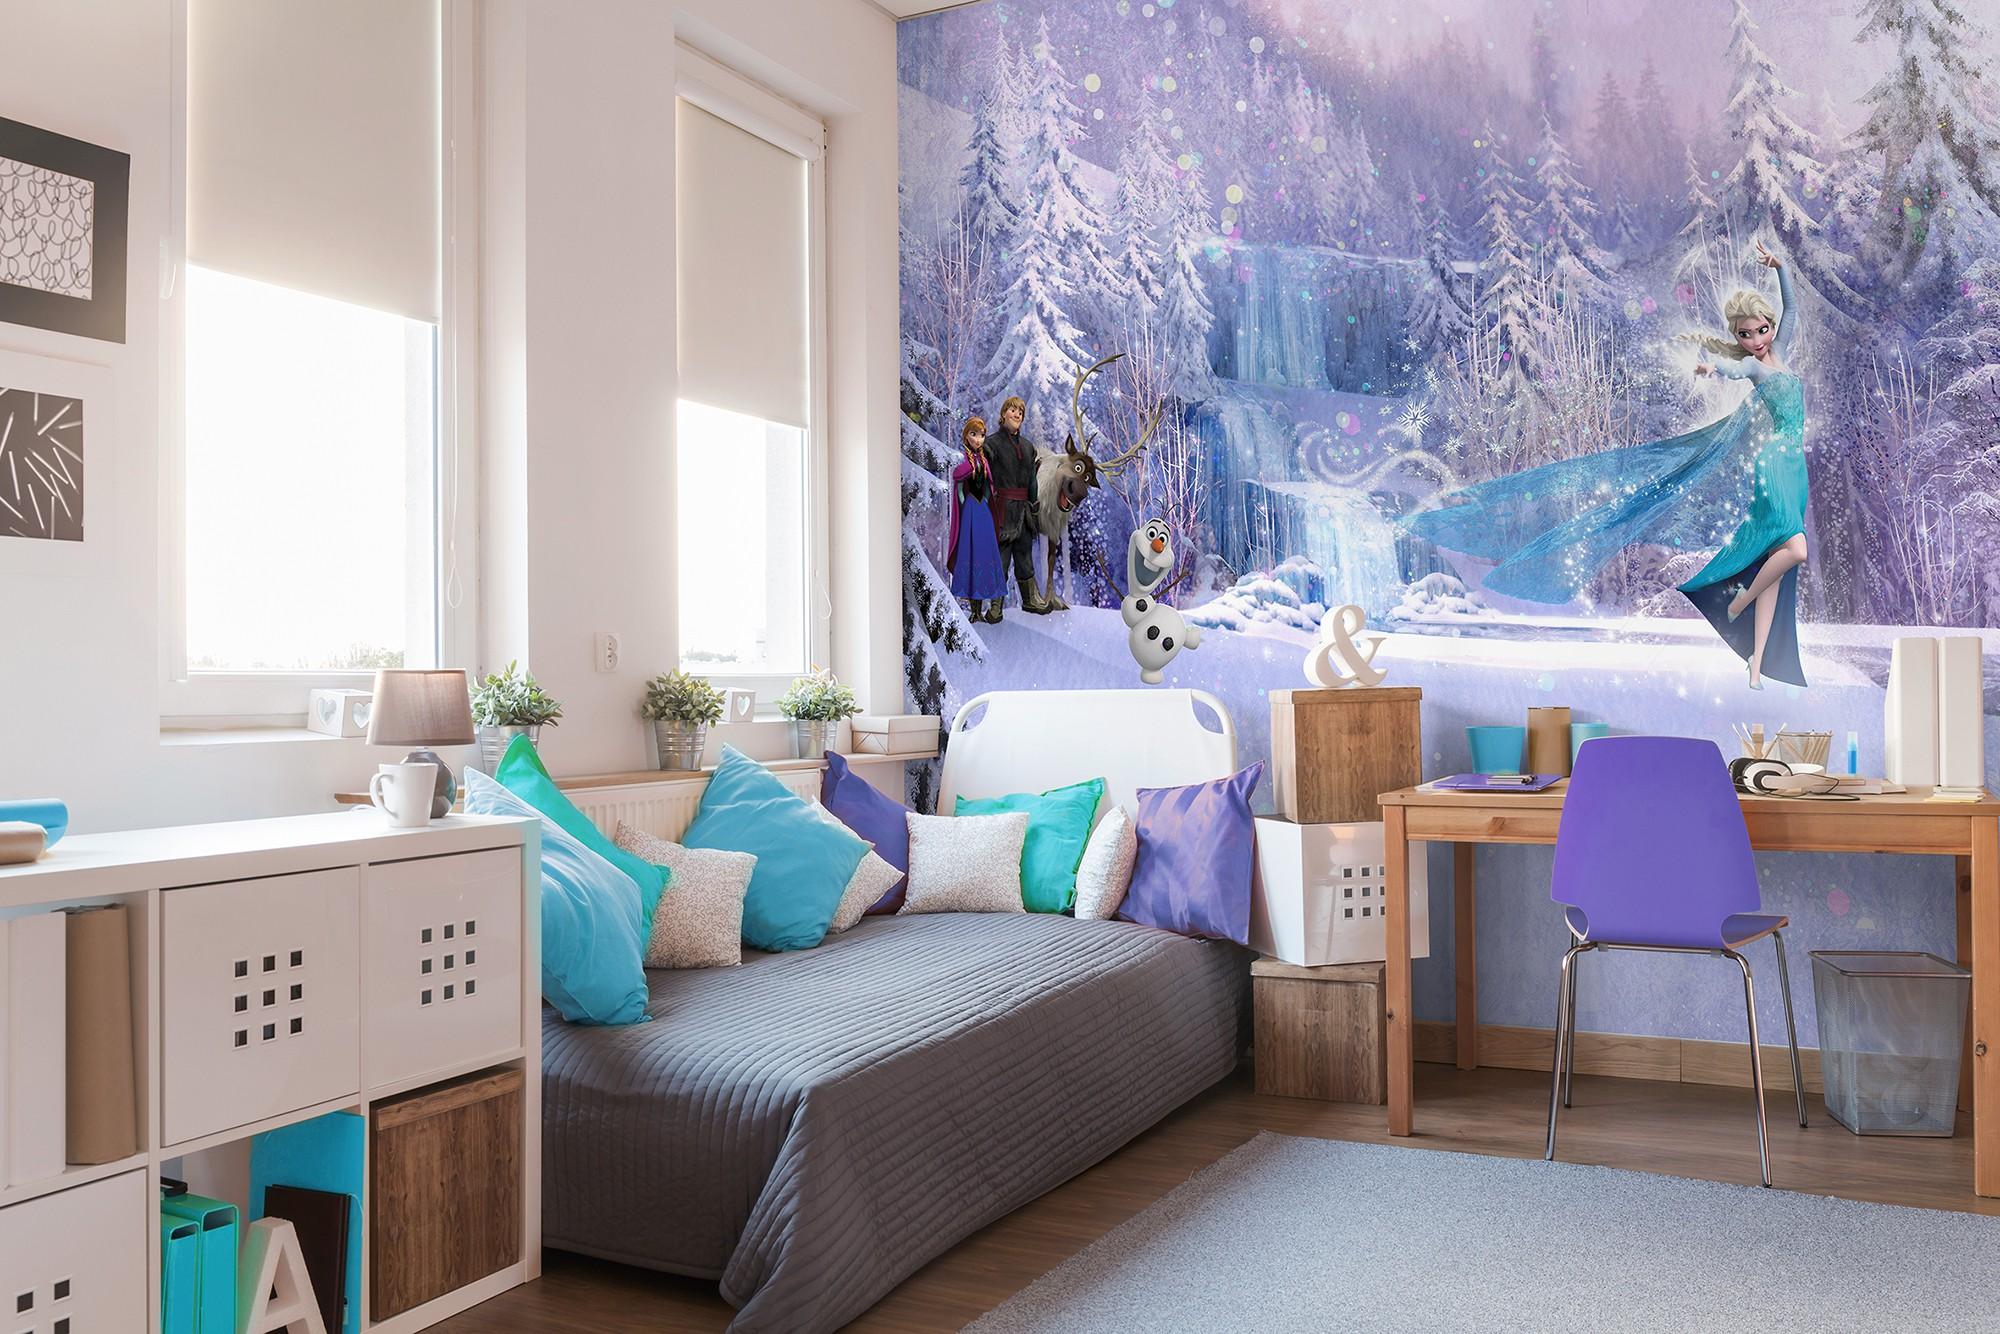 Fototapete Kinderzimmer | Fototapeten Fur Lebendige Kinderzimmer Cleankids Magazin